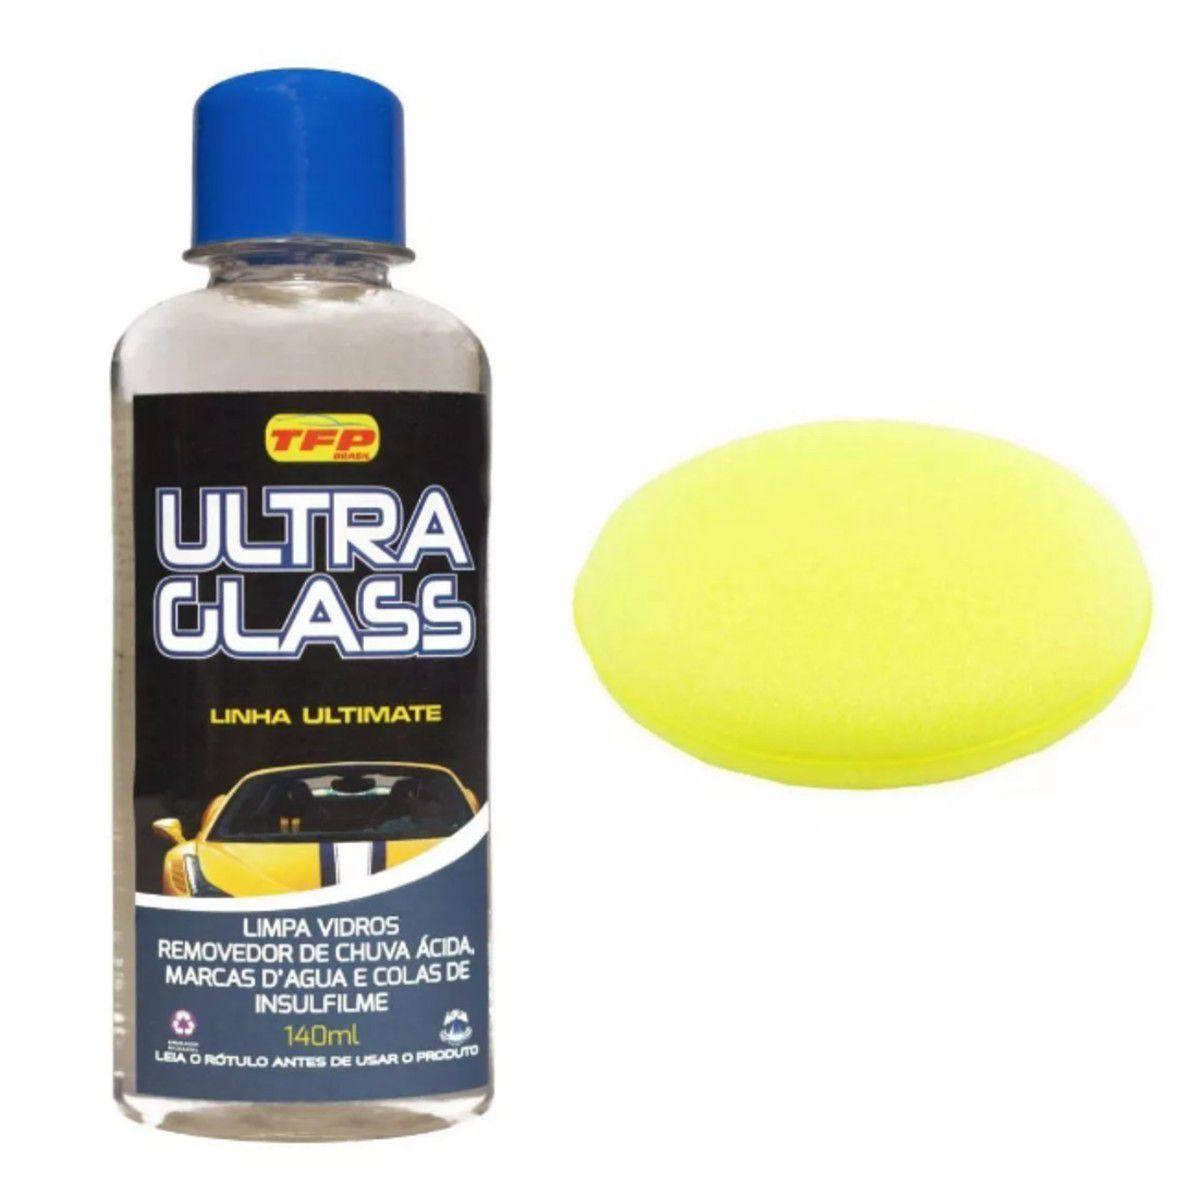 Removedor De Chuva Ácida Ultra Glass Tira Mancha Limpa Vidro + Esponja